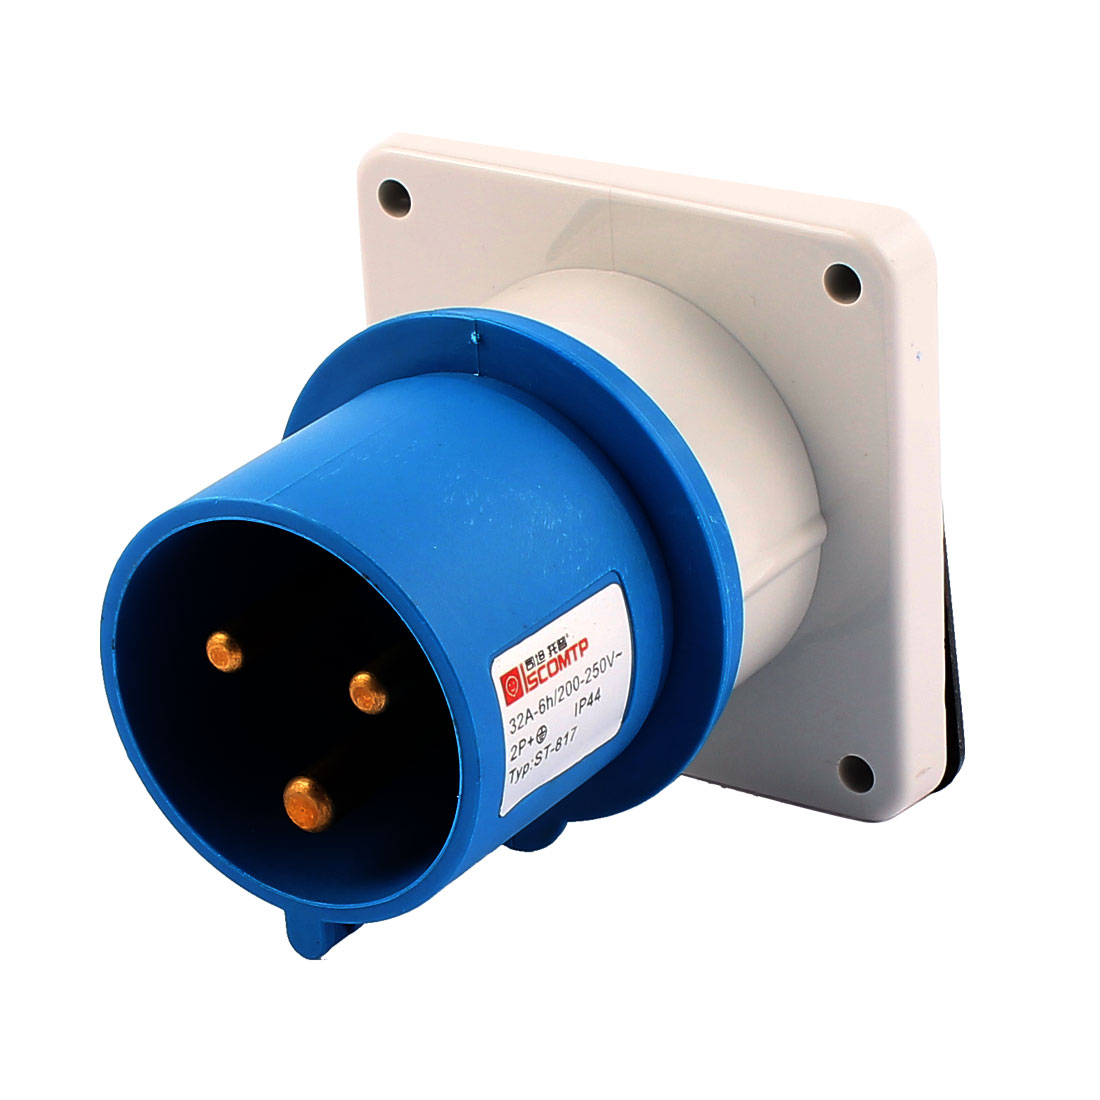 AC 200V-250V 32A IP44 2P+E 3 Terminal Male Industrial Panel Mounting Plug